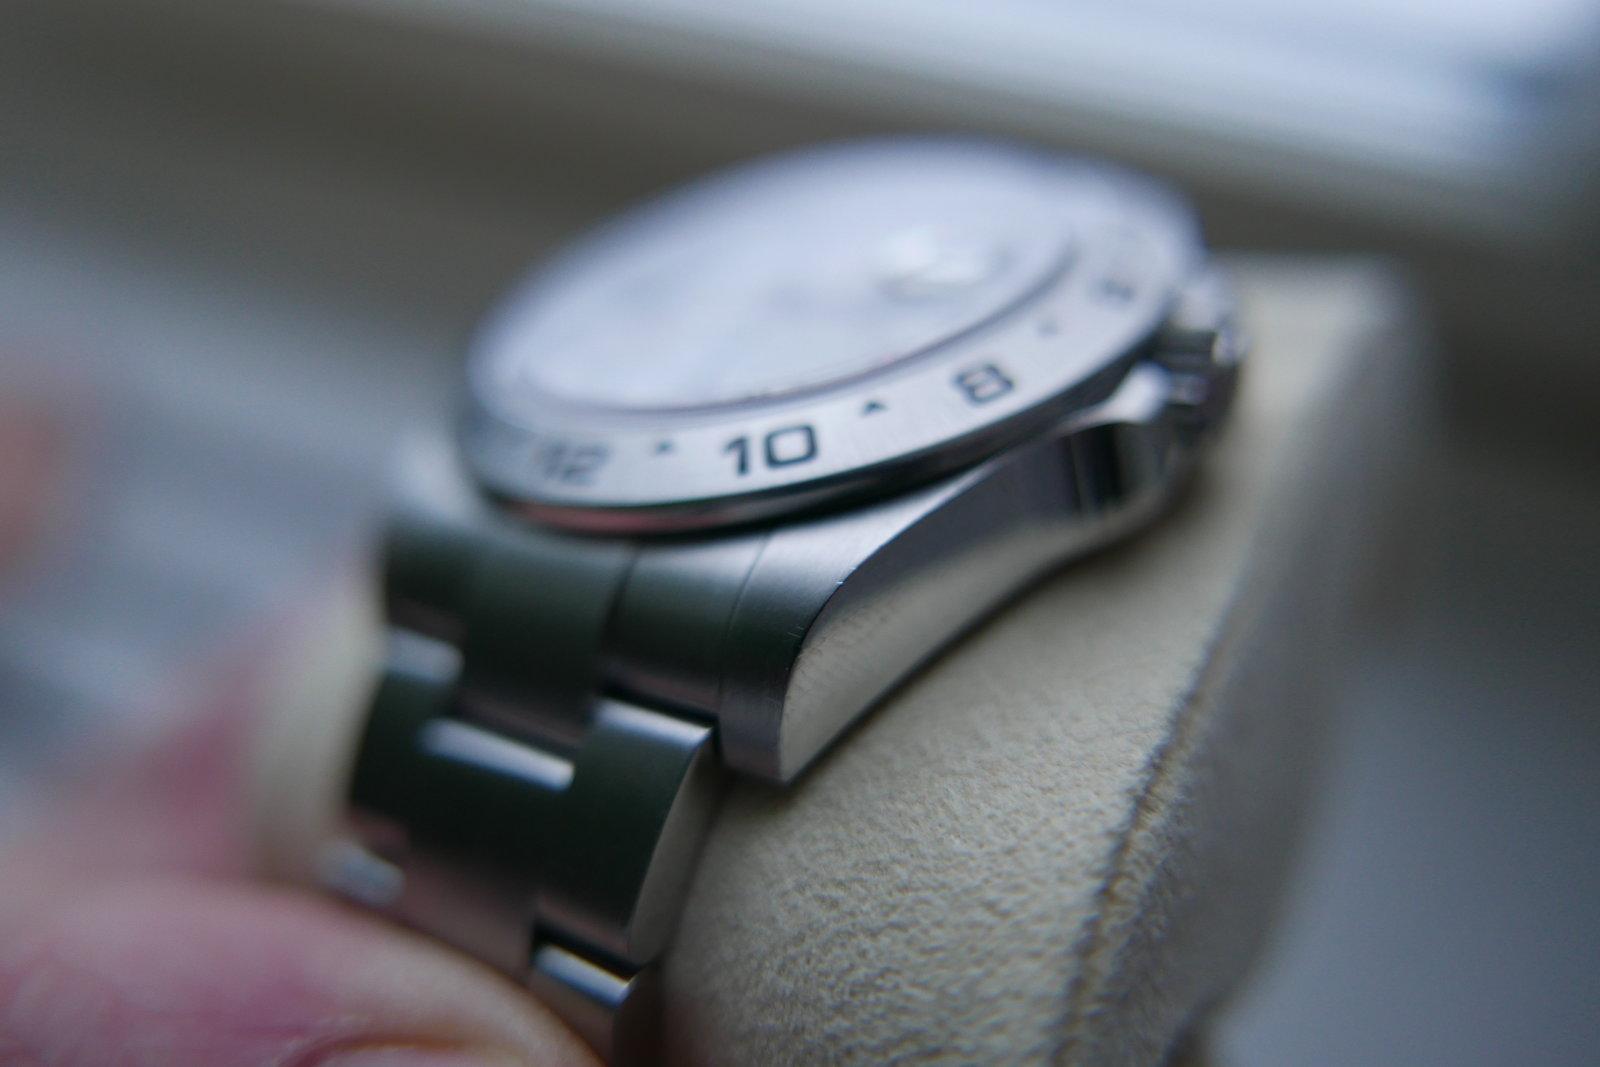 P1020094.JPG